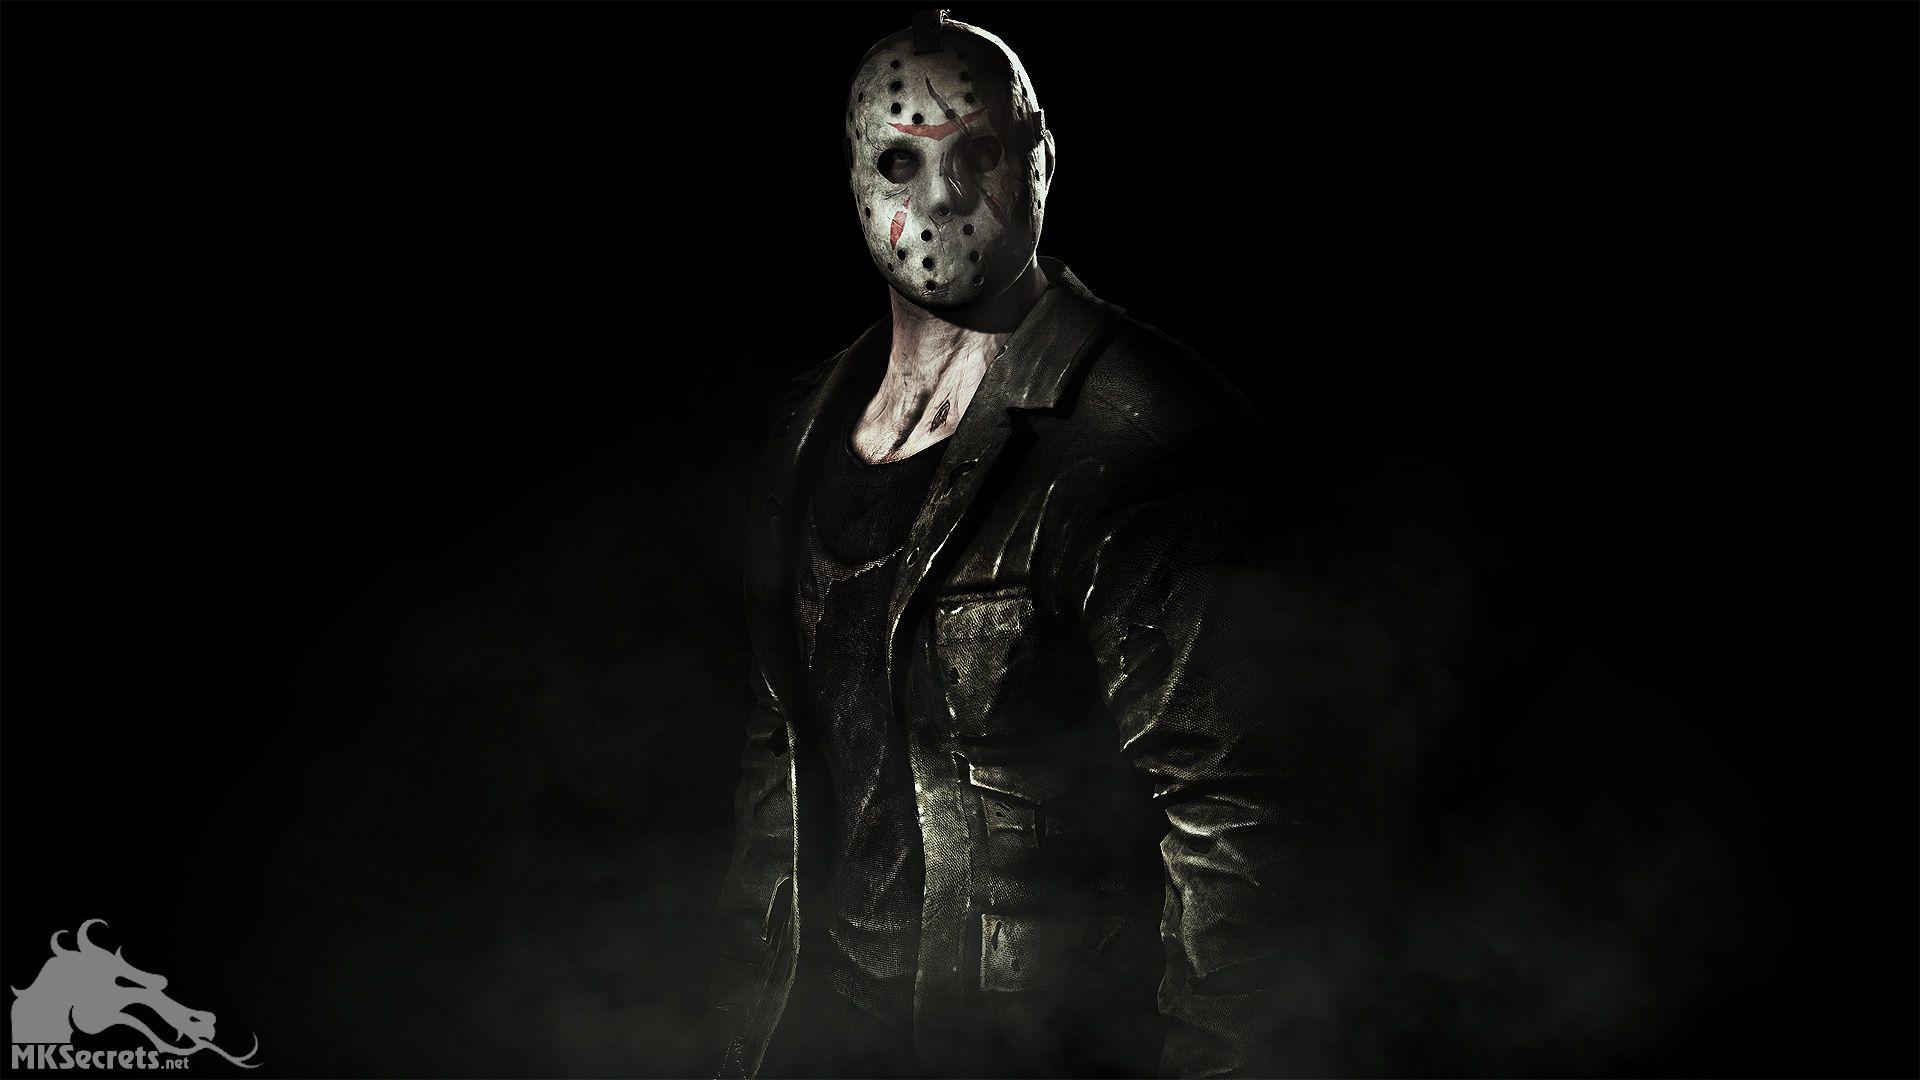 Interactive Entertainment Announced That The Mortal Kombat X Jason